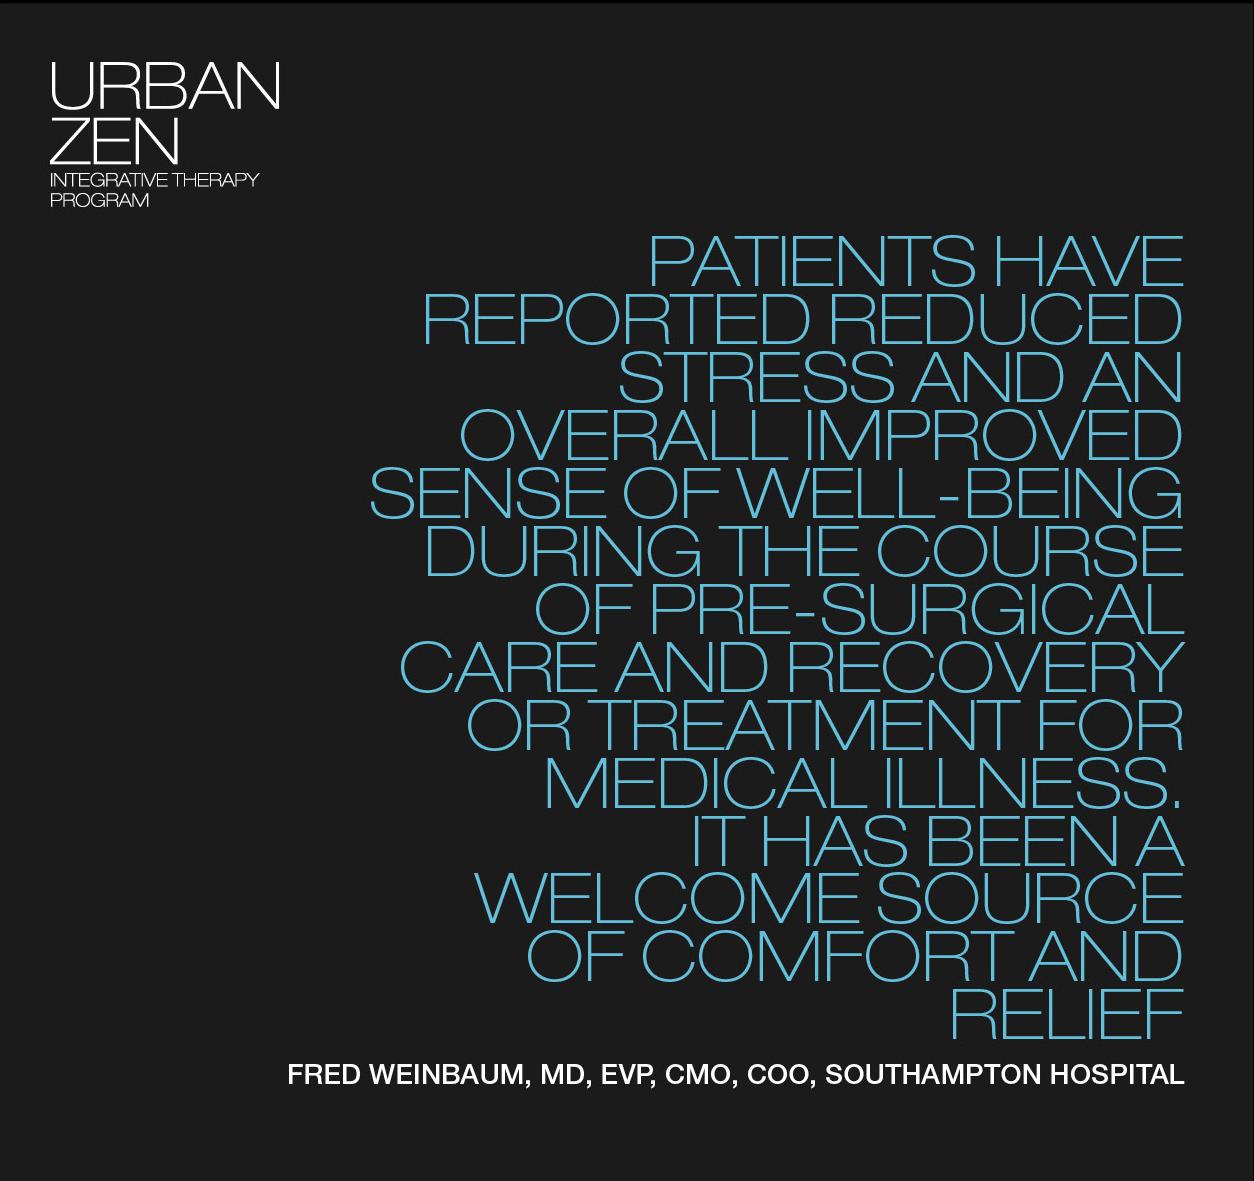 UZIT-patient-testimonial16_05